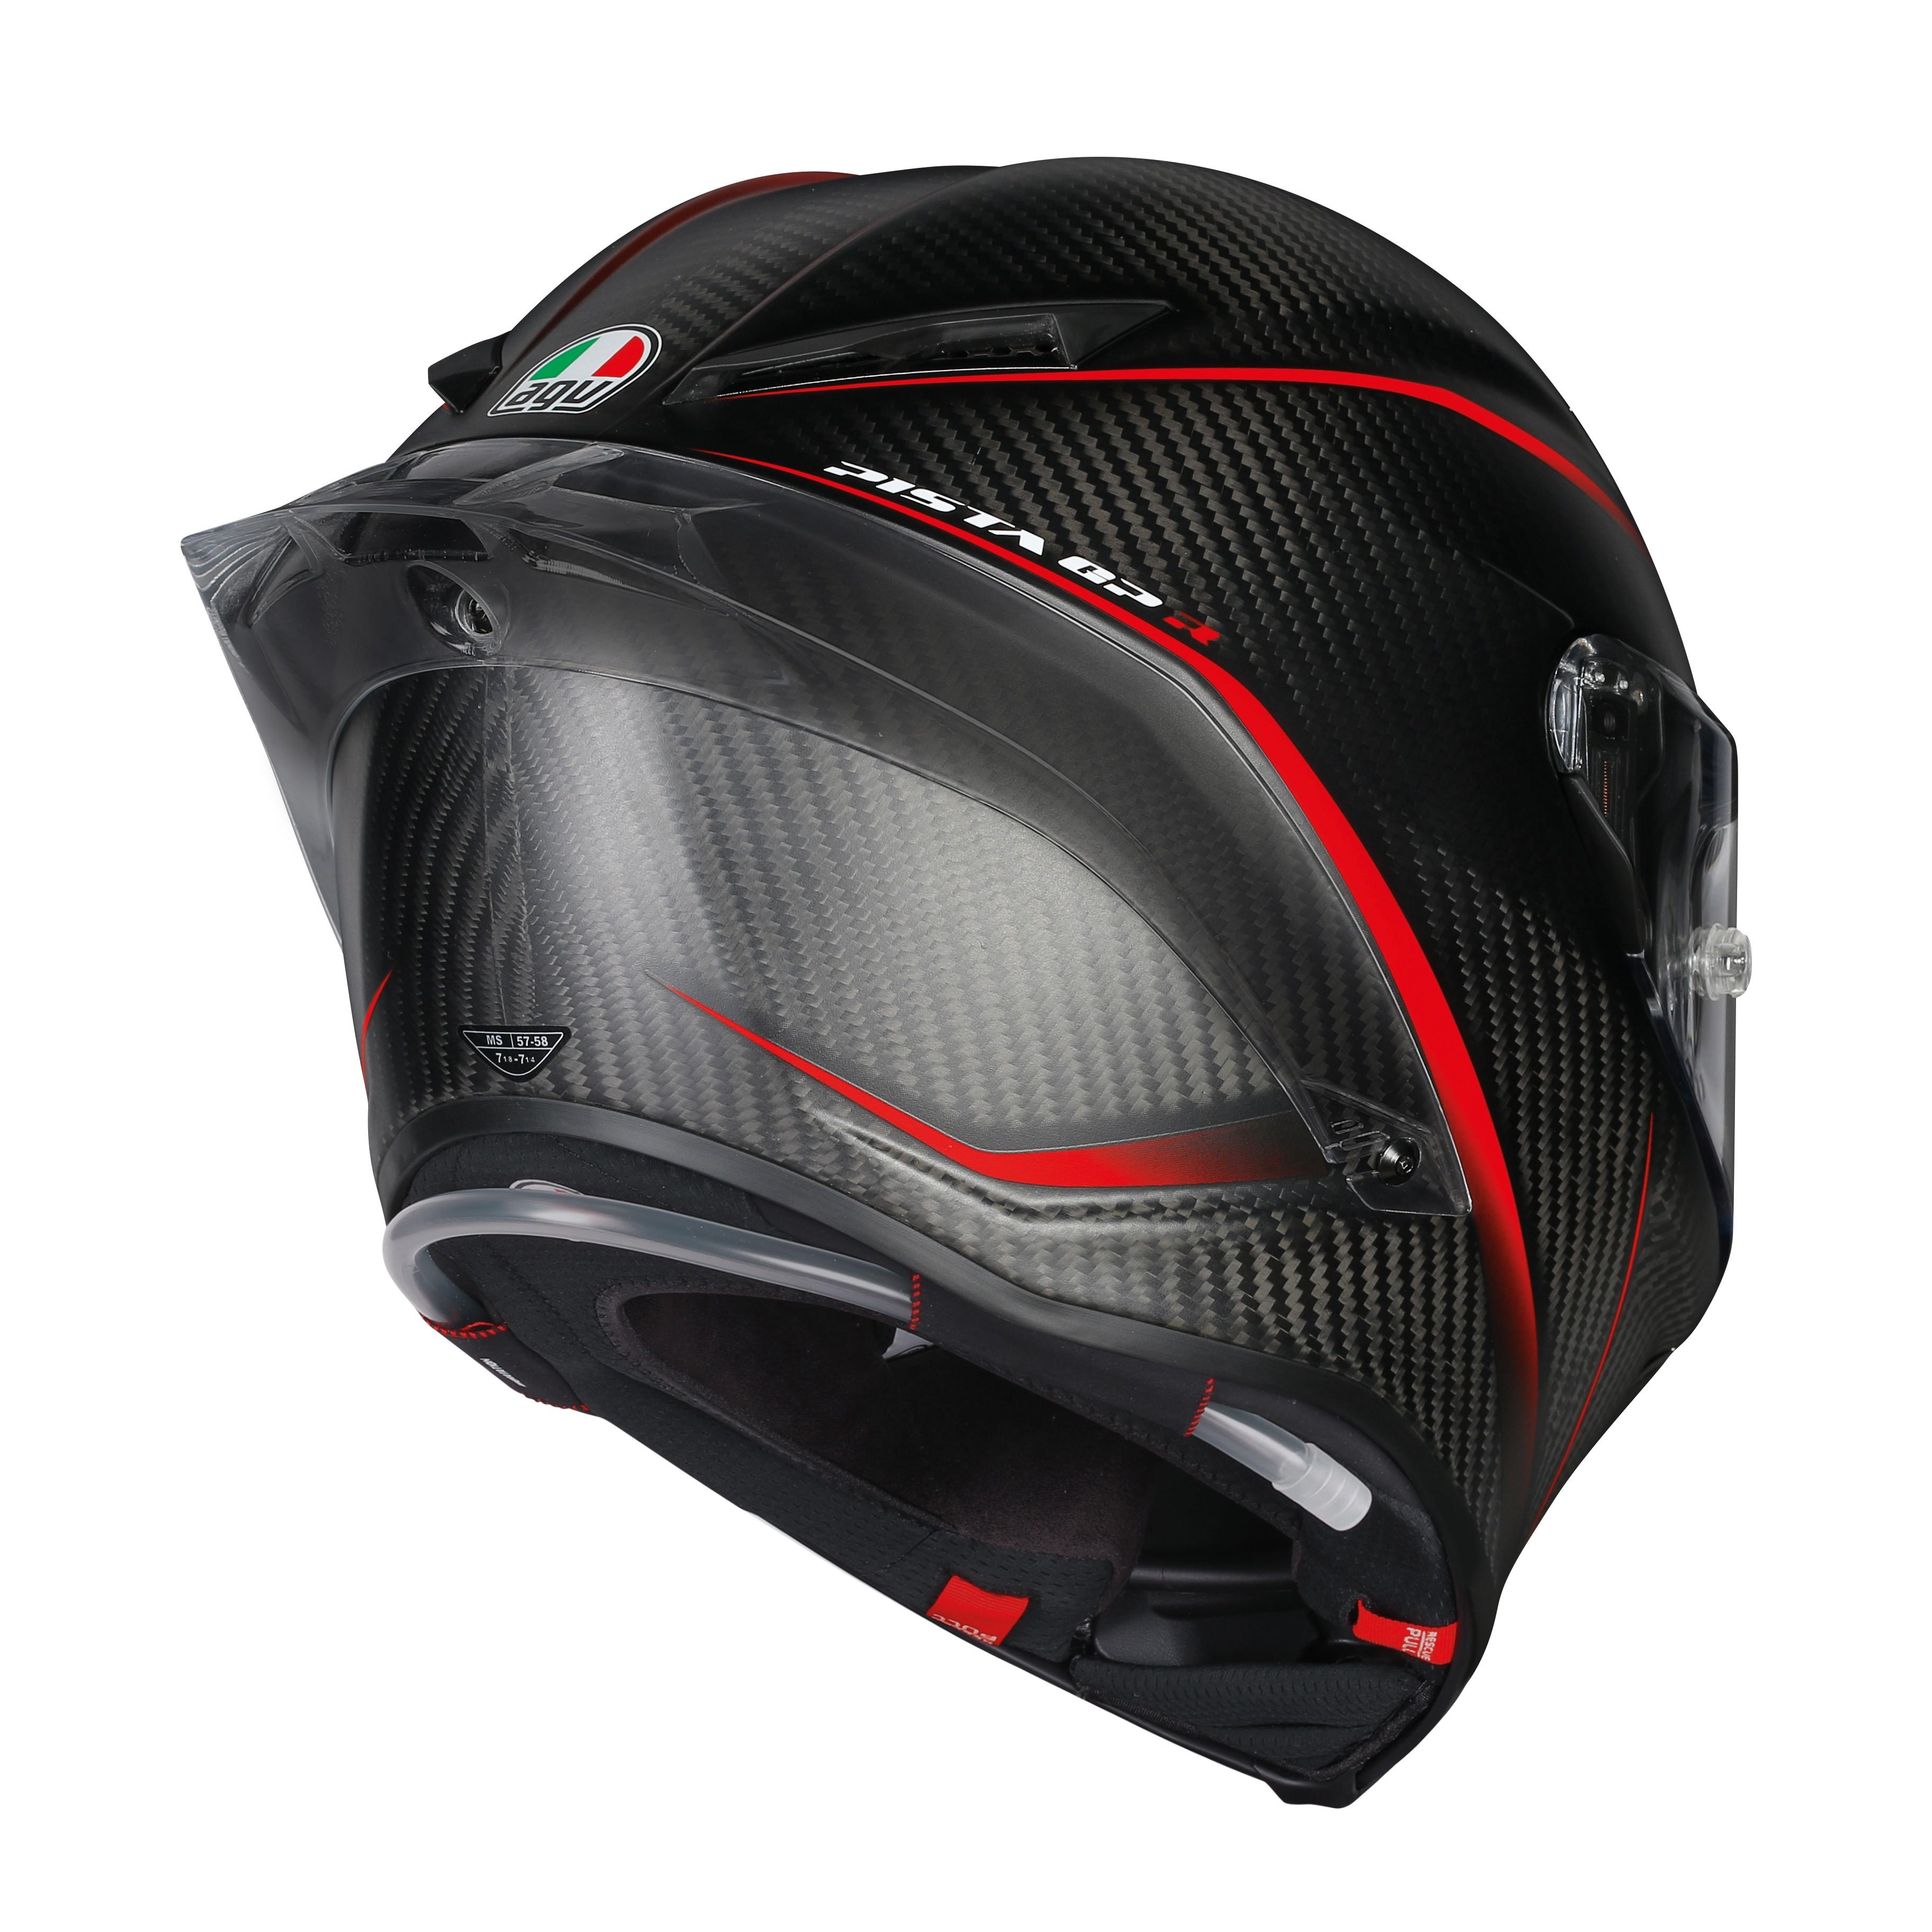 agv pista gp r gran premio full face track helmet. Black Bedroom Furniture Sets. Home Design Ideas